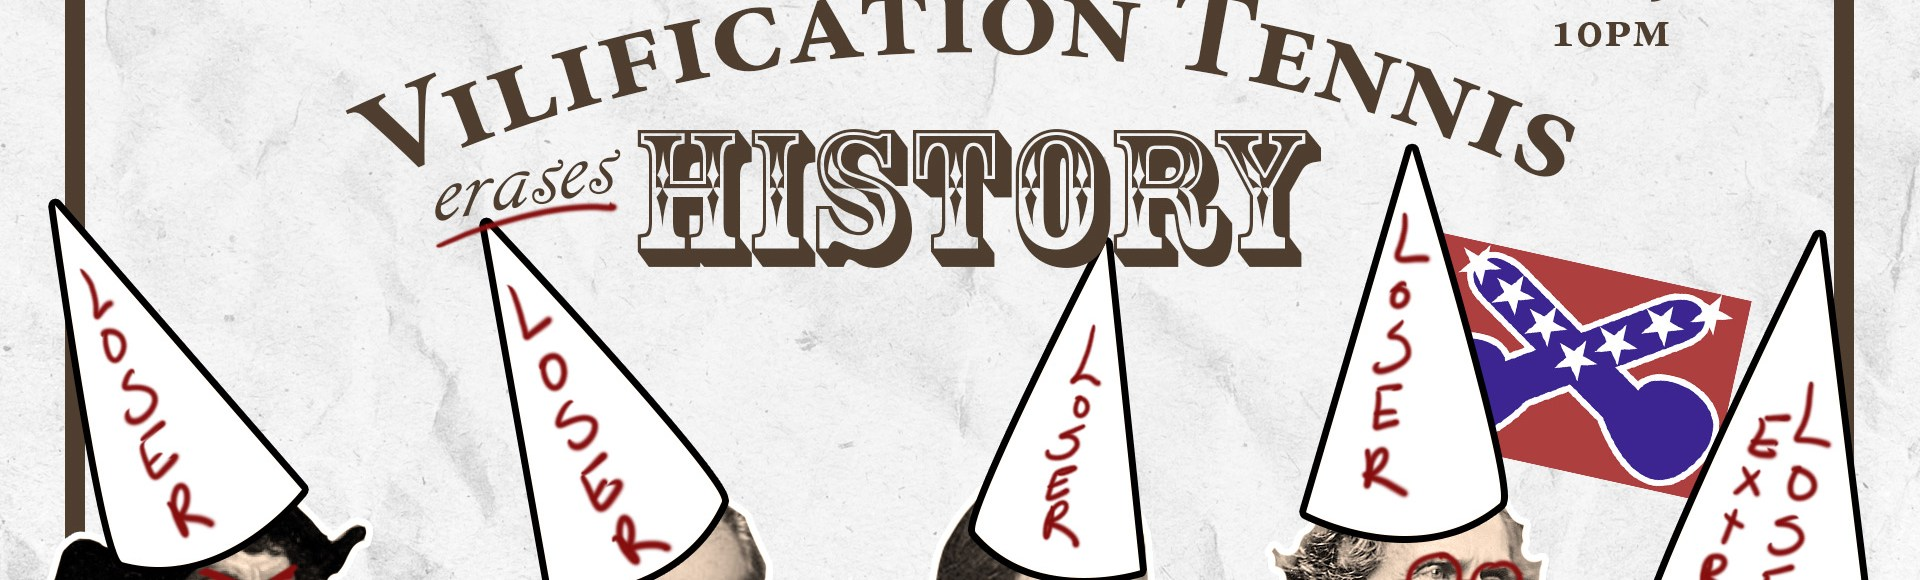 9/25/2020 – VilTen Erases History!